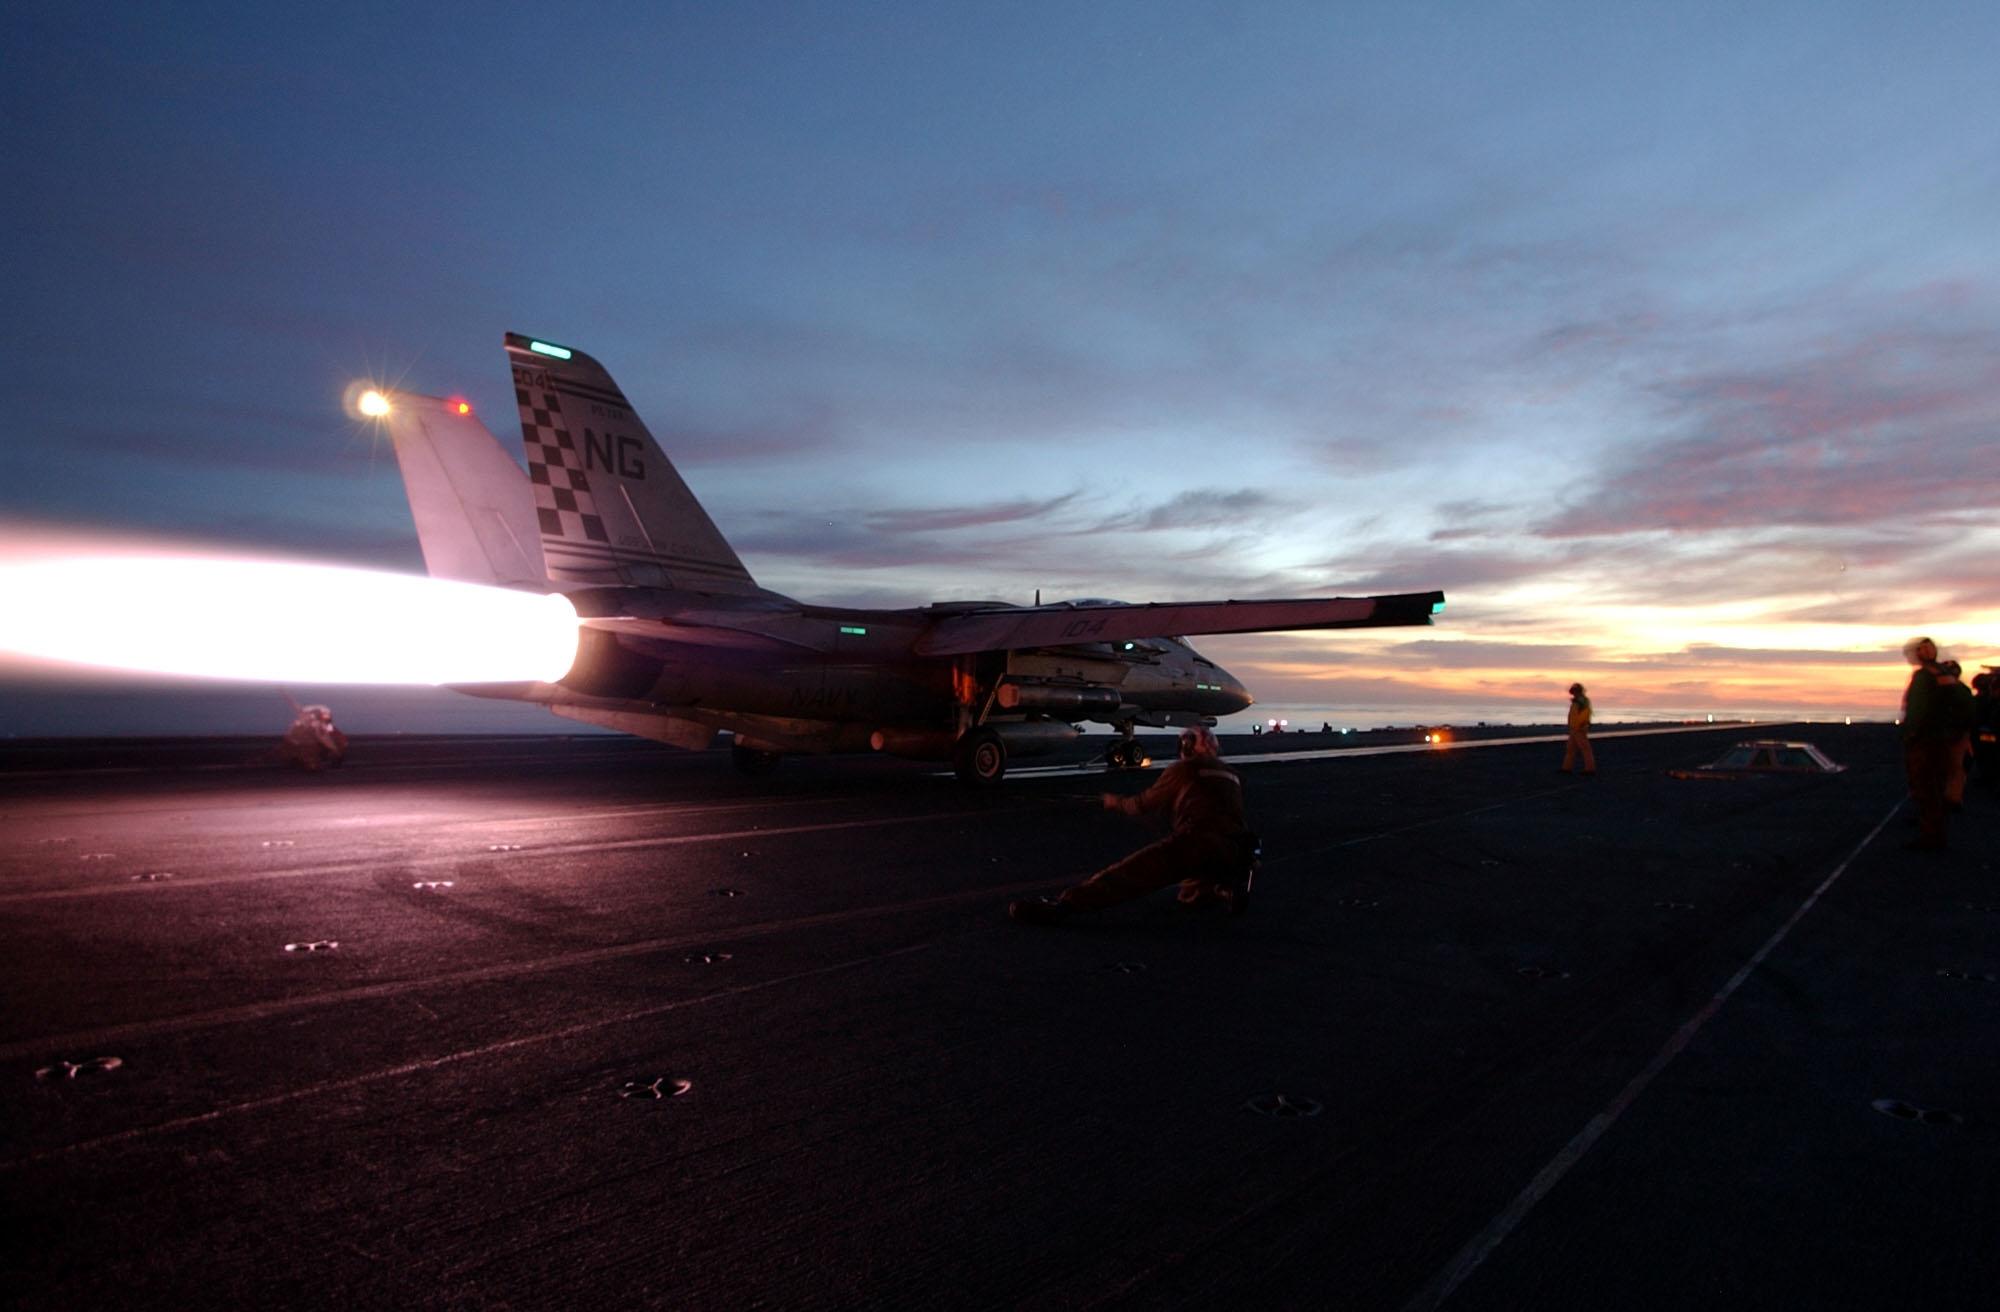 39863_aircraft_military_airplane.jpg